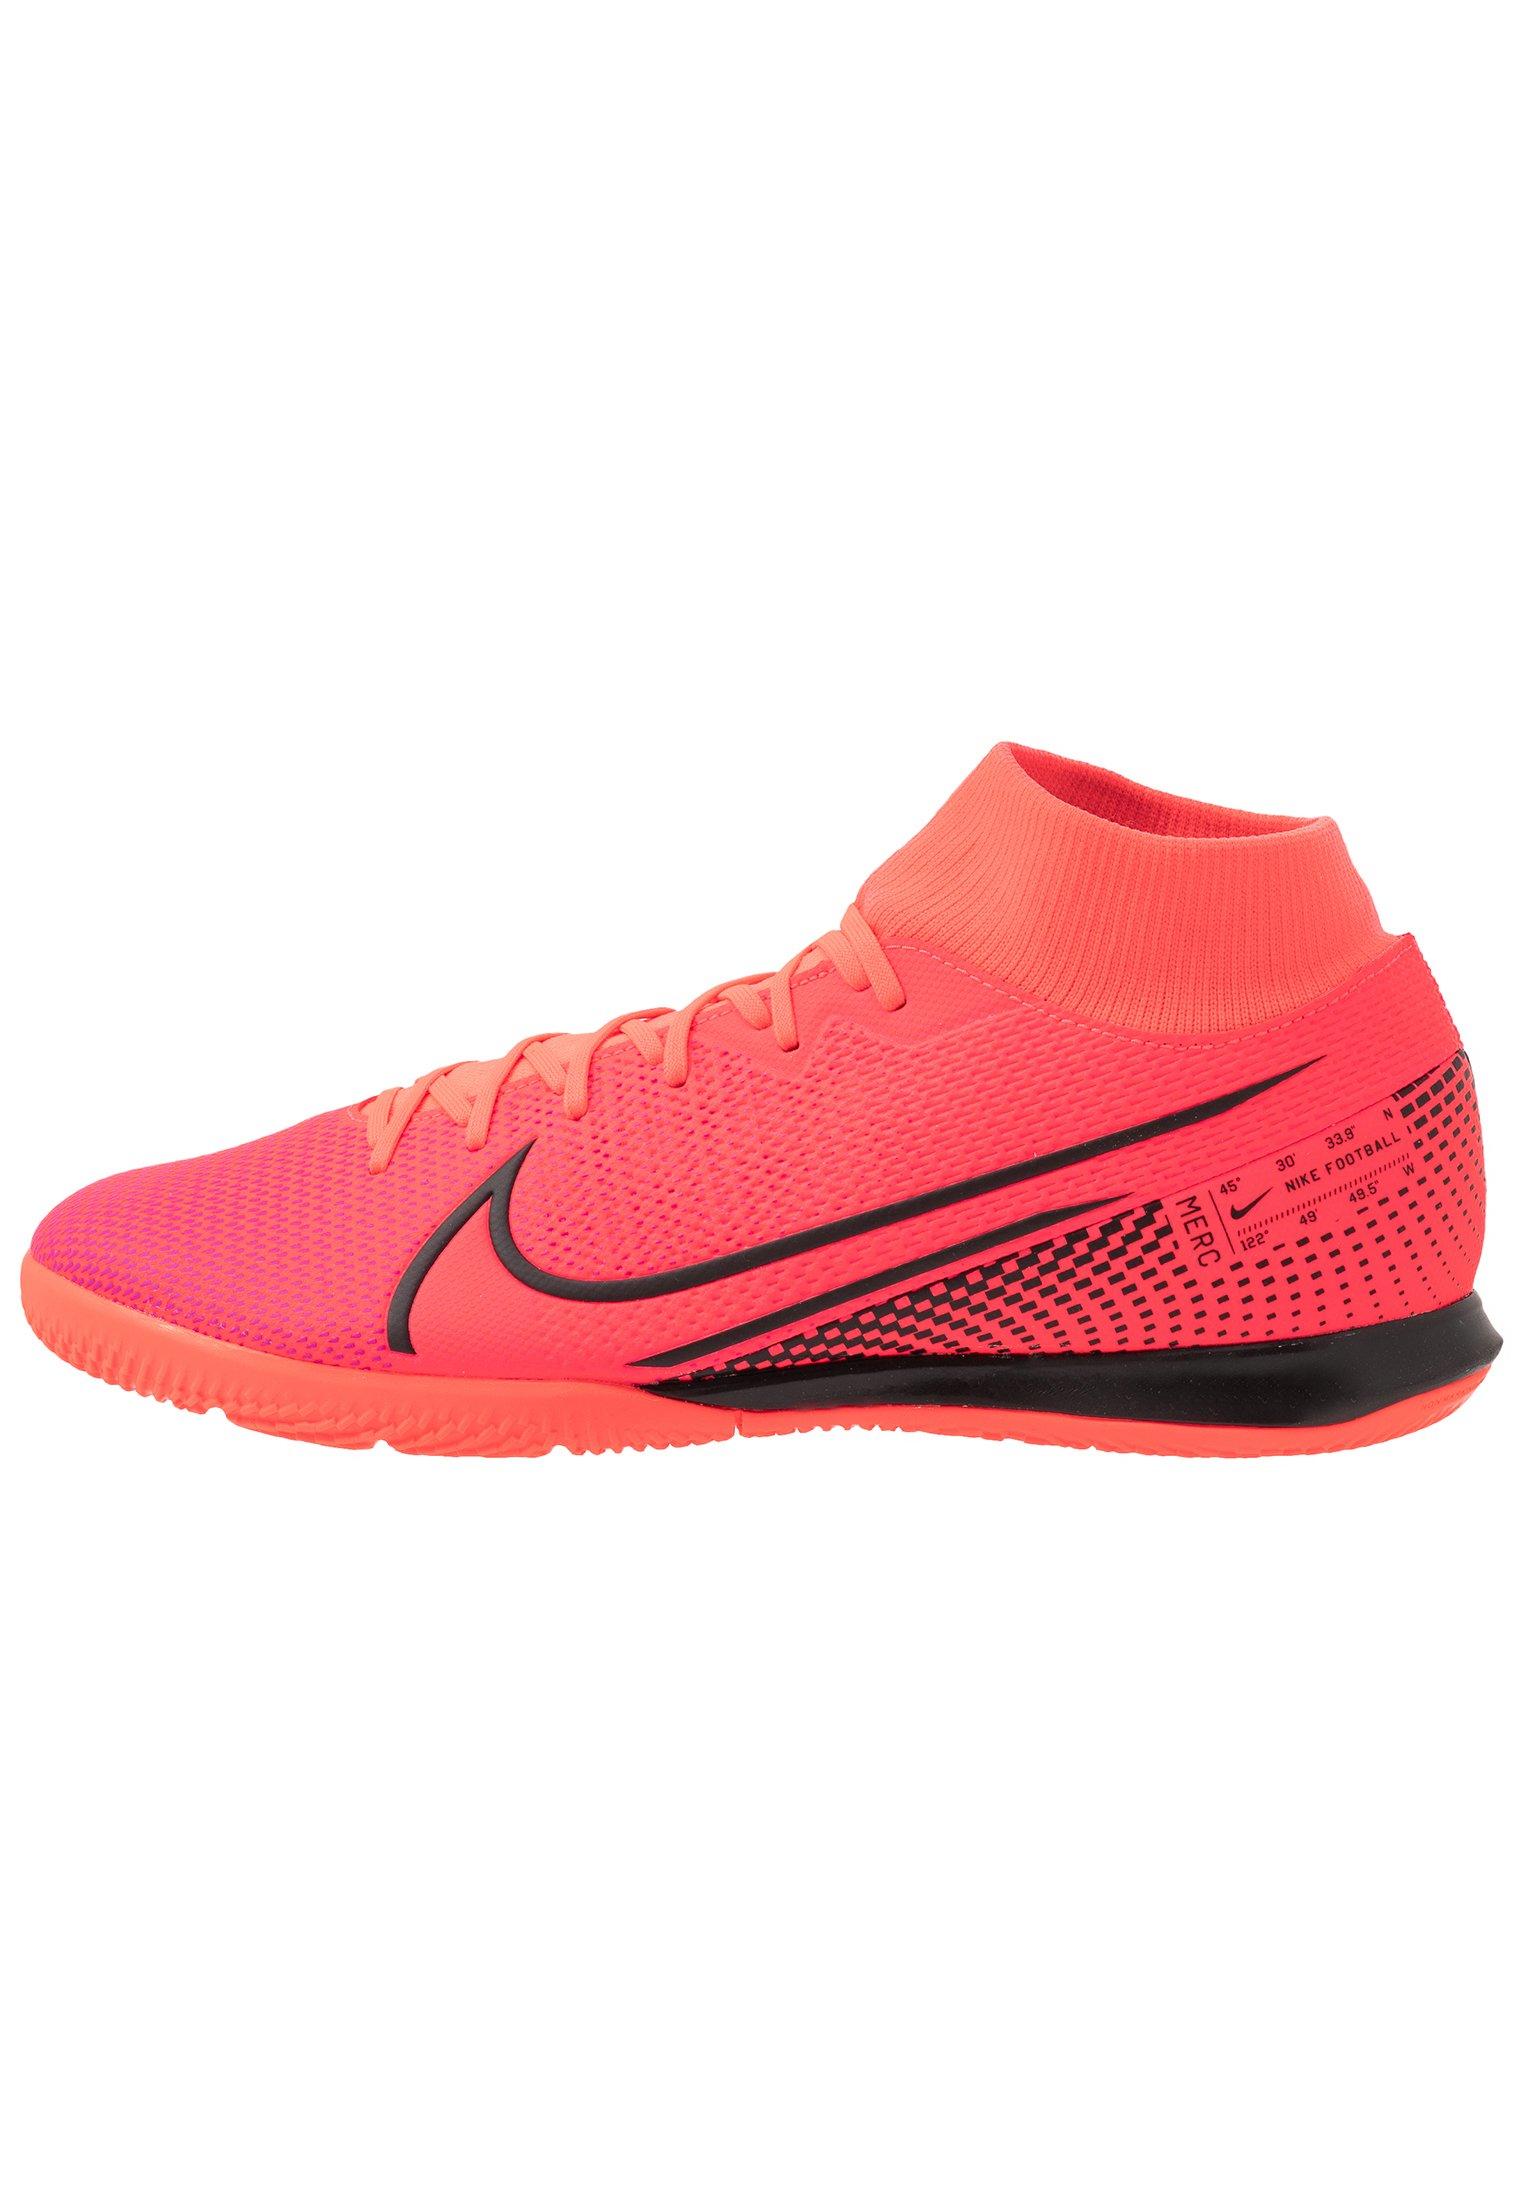 chaussure footsalle nike